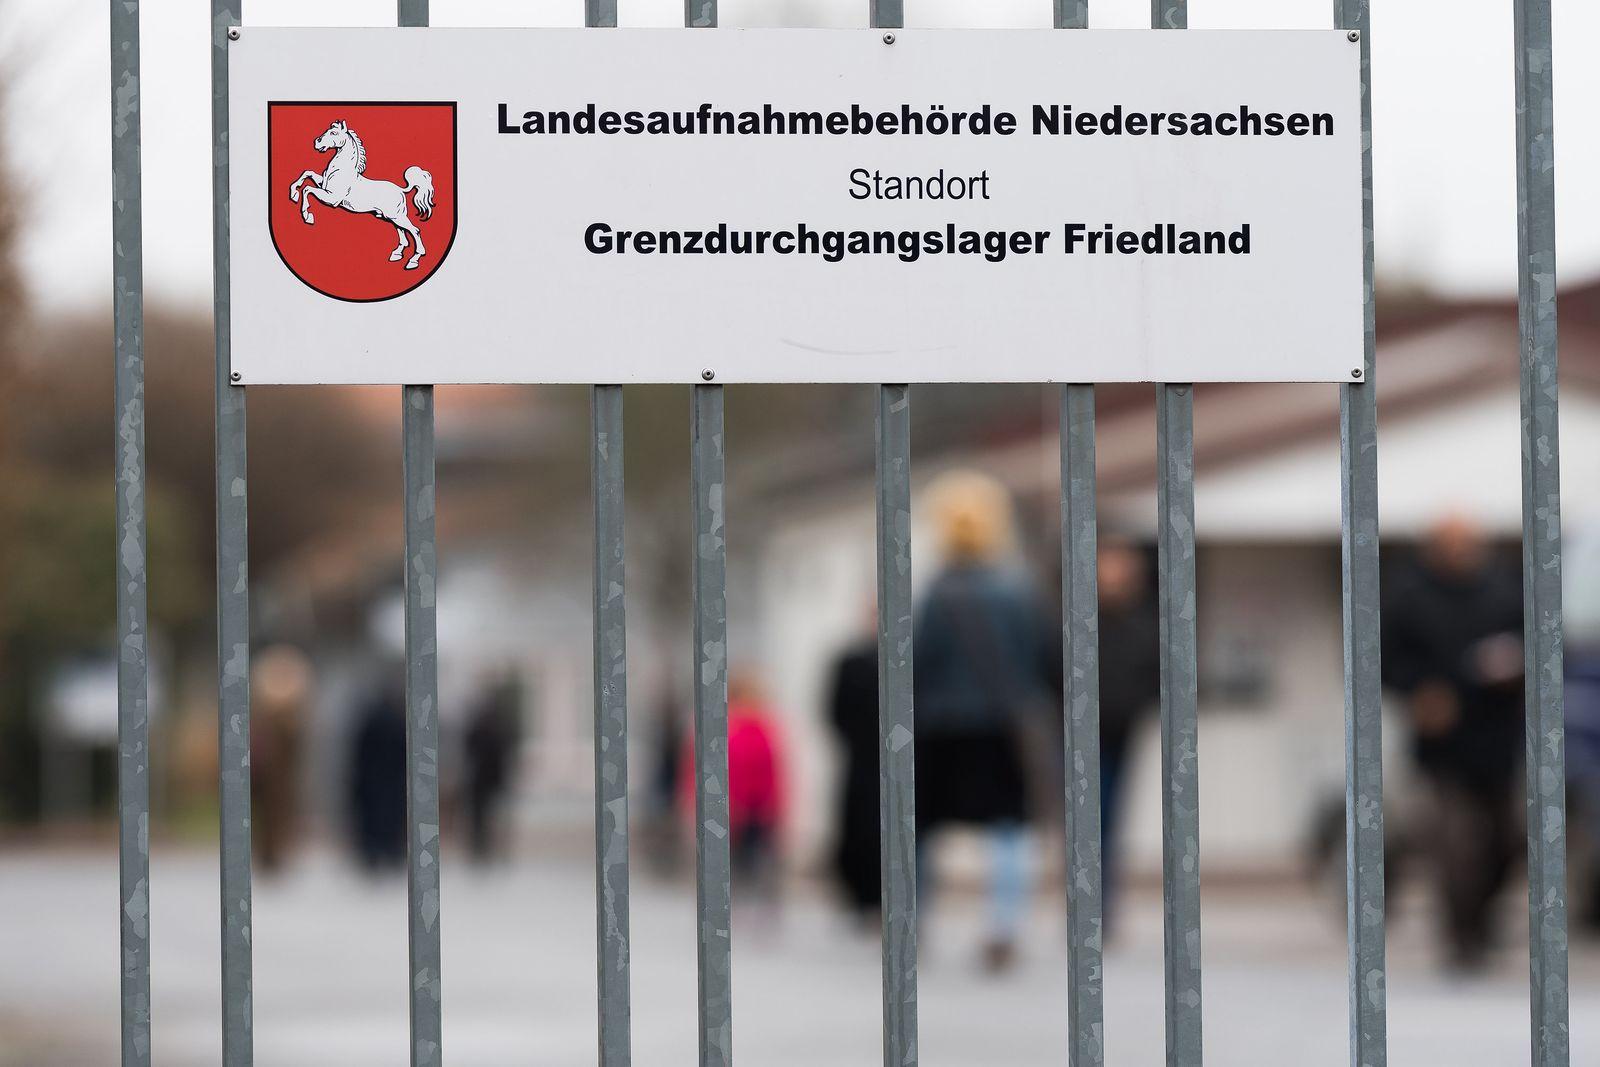 Grenzdurchgangslager Friedland